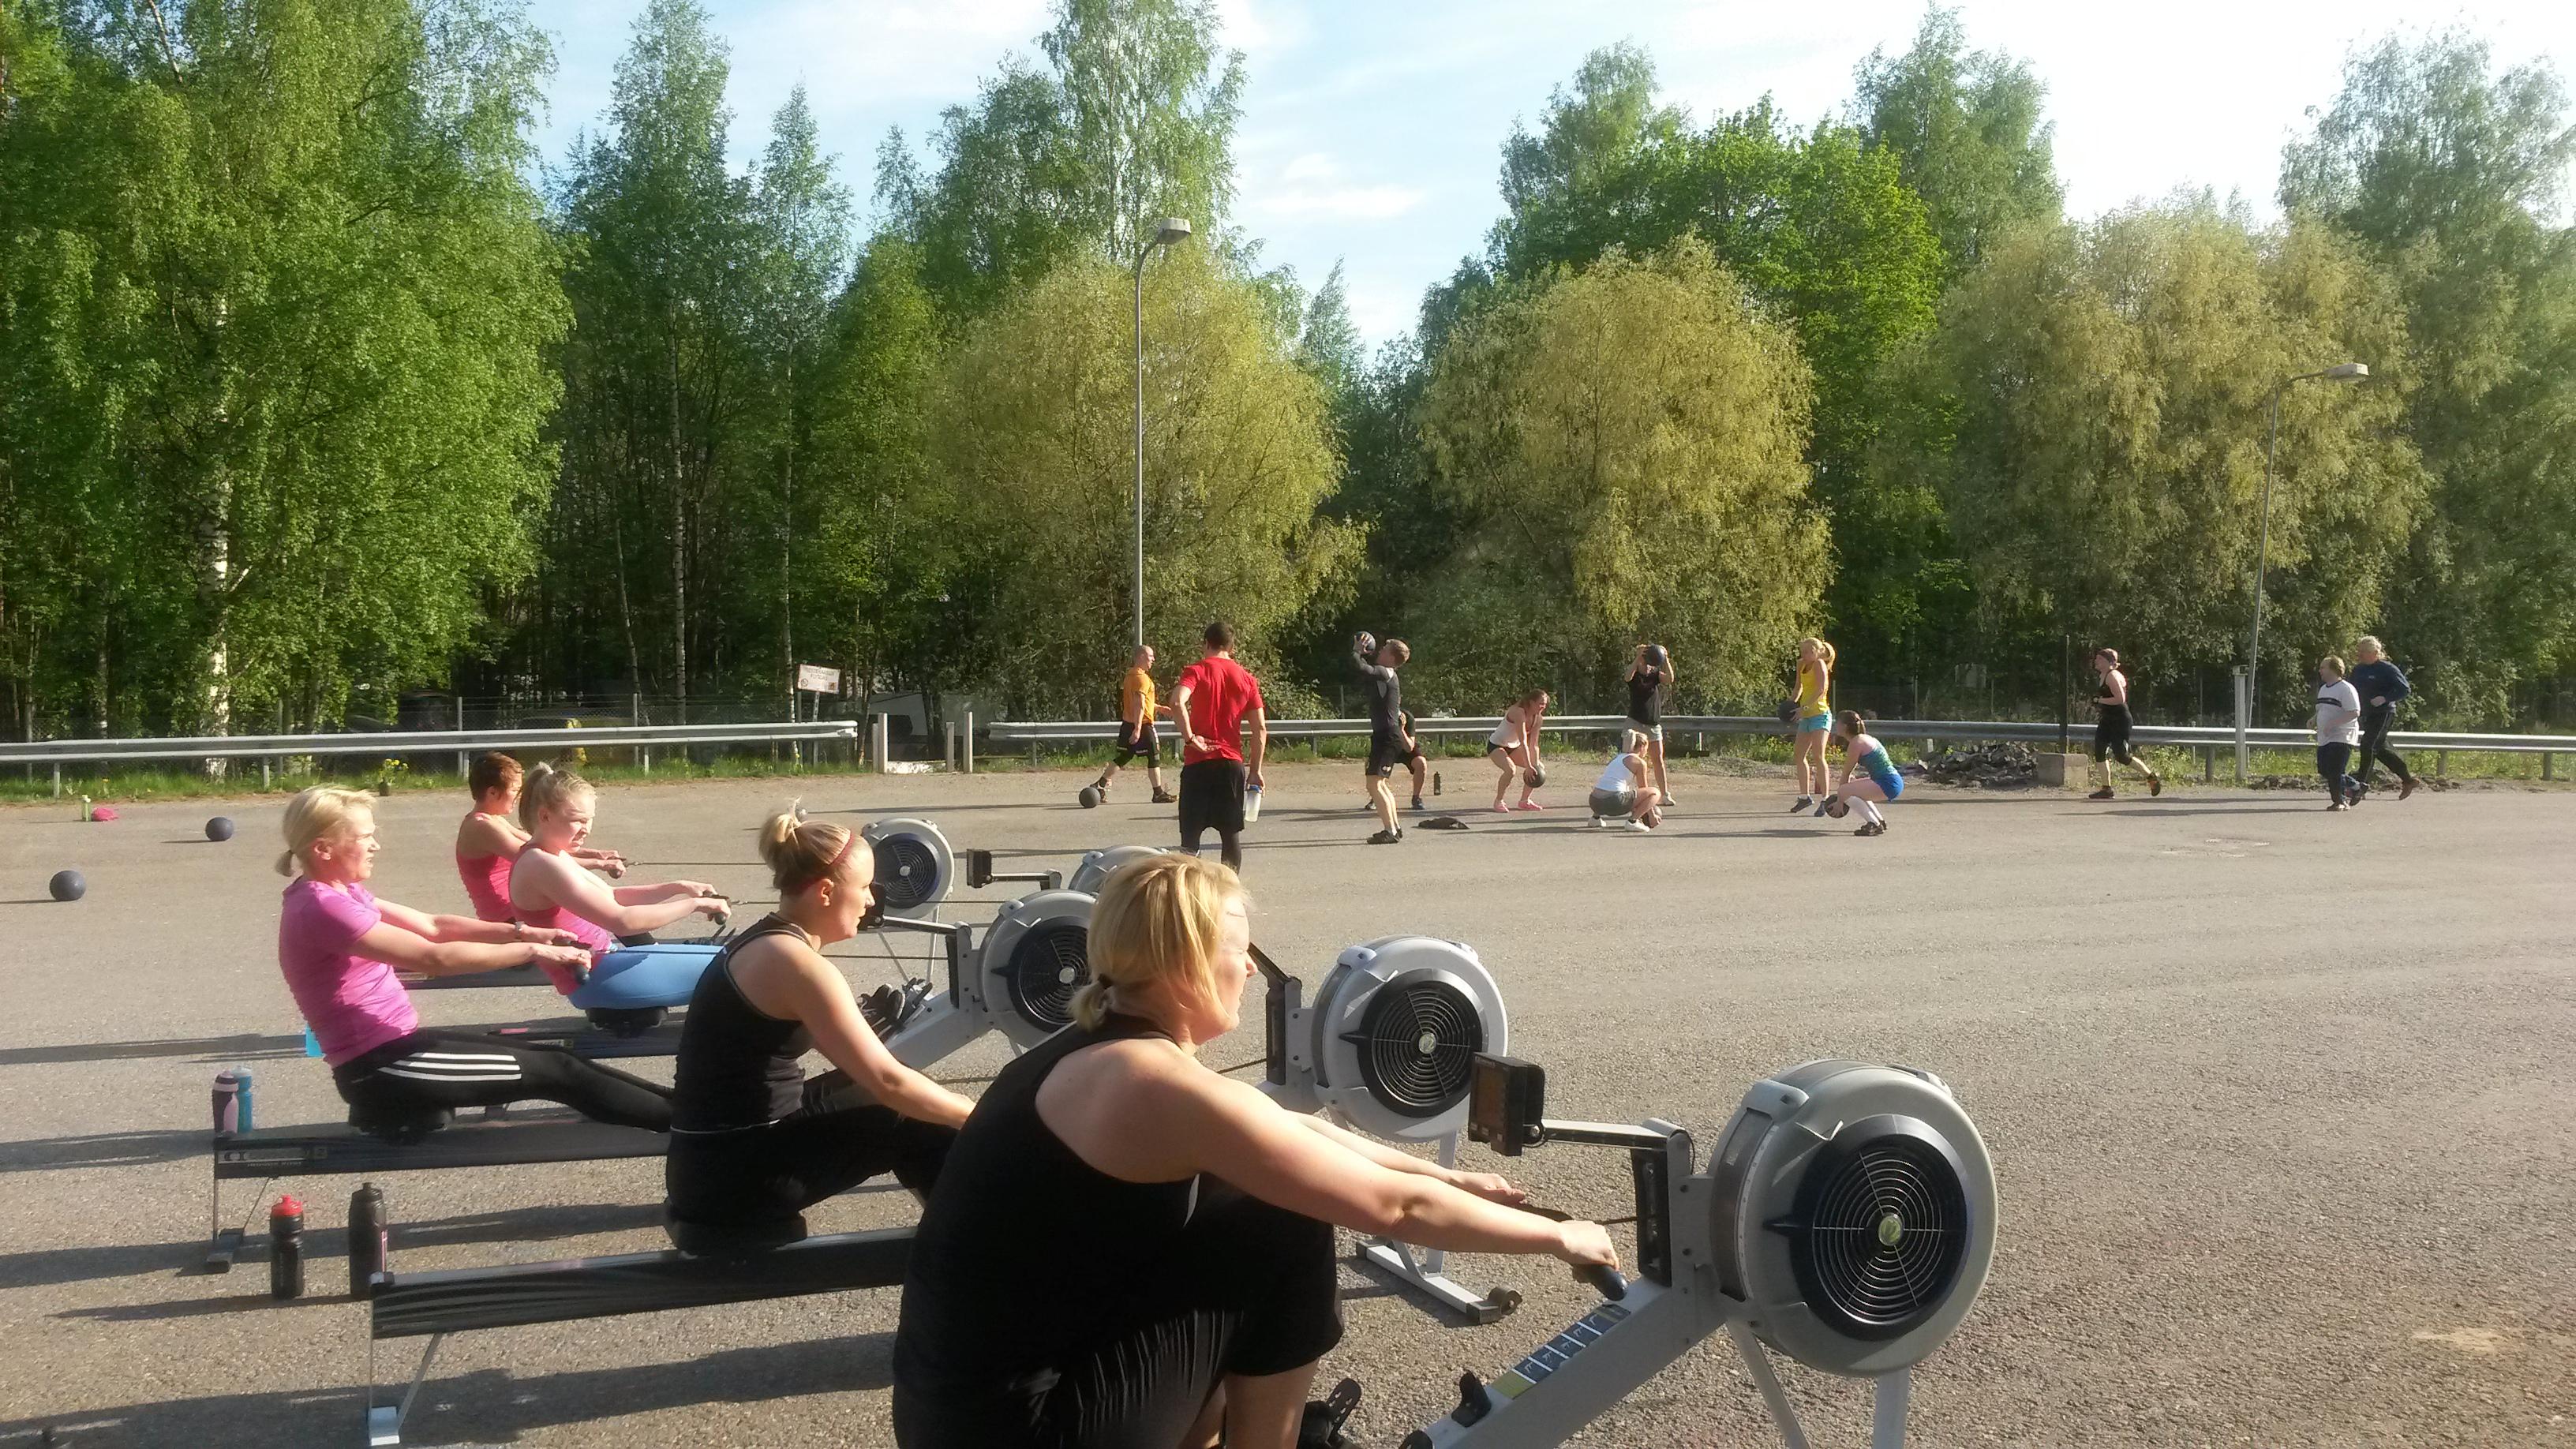 Gymnastics WOD ja Endurance WOD